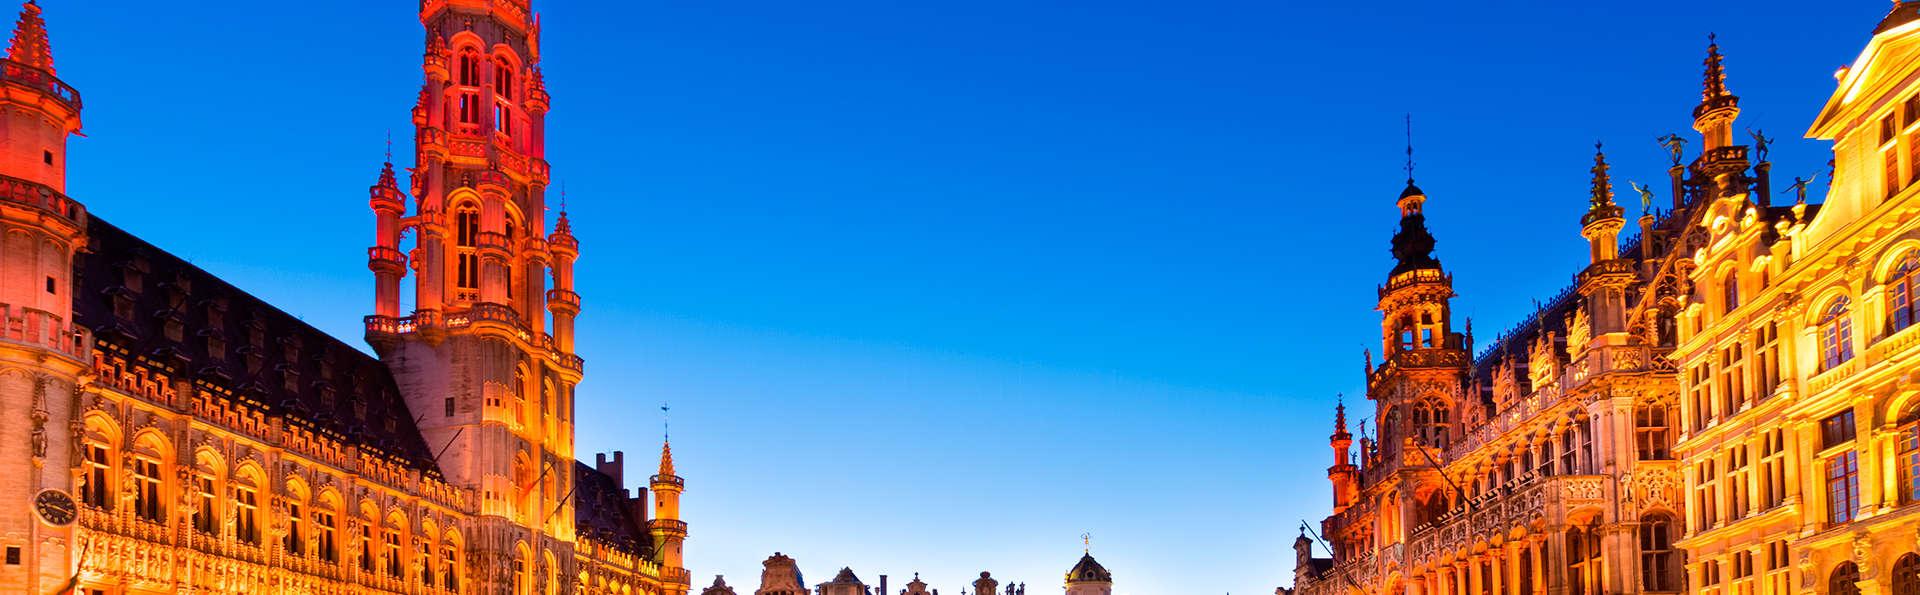 Floris Arlequin Grand Place - EDIT_destination1.jpg